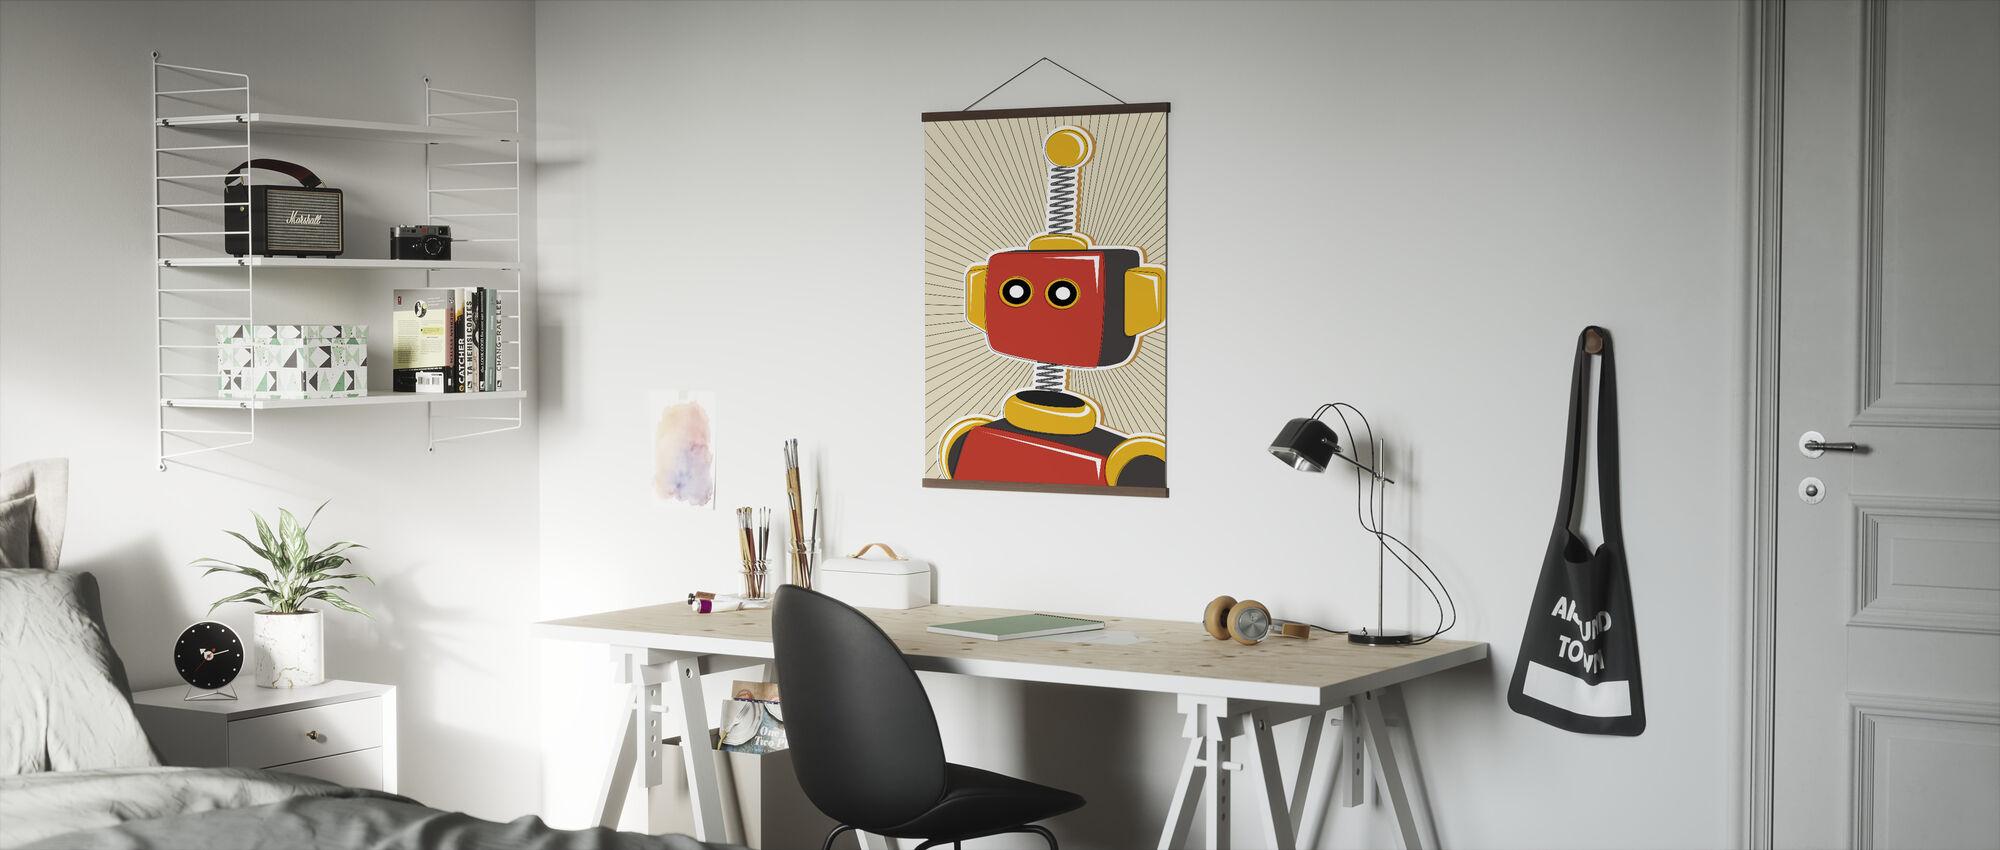 Retro Robot - Poster - Office